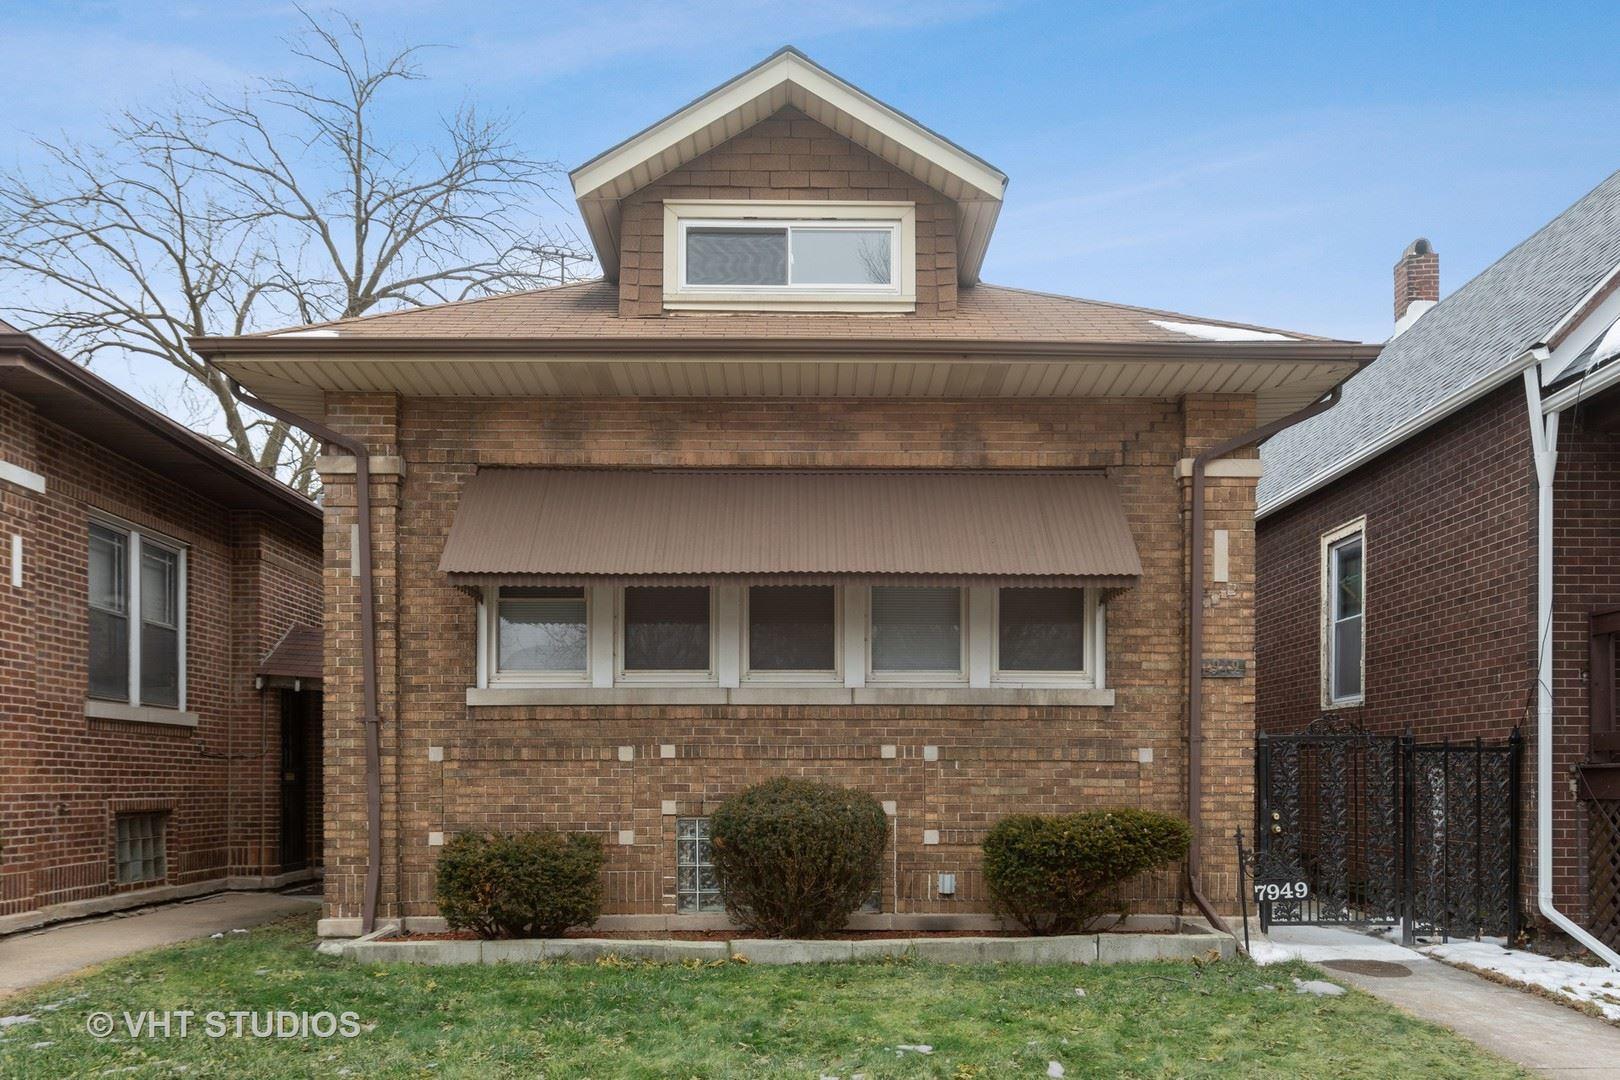 7949 S Manistee Avenue, Chicago, IL 60617 - #: 10713996